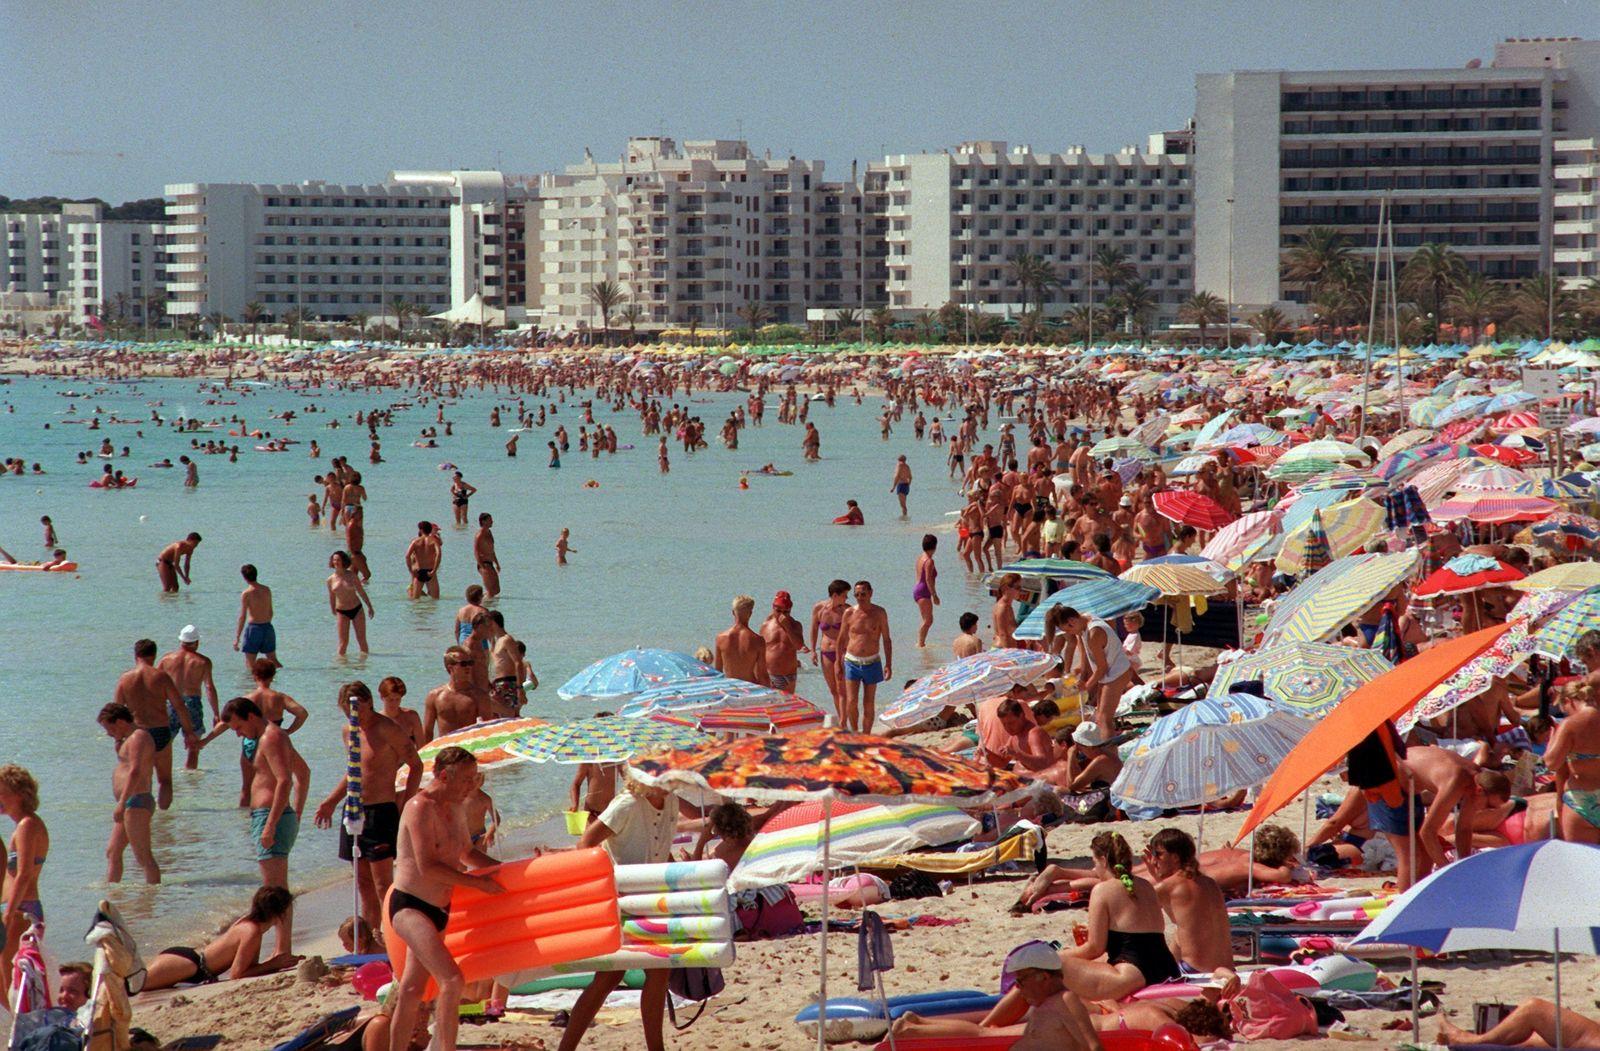 Urlaub auf Mallorca/Strand